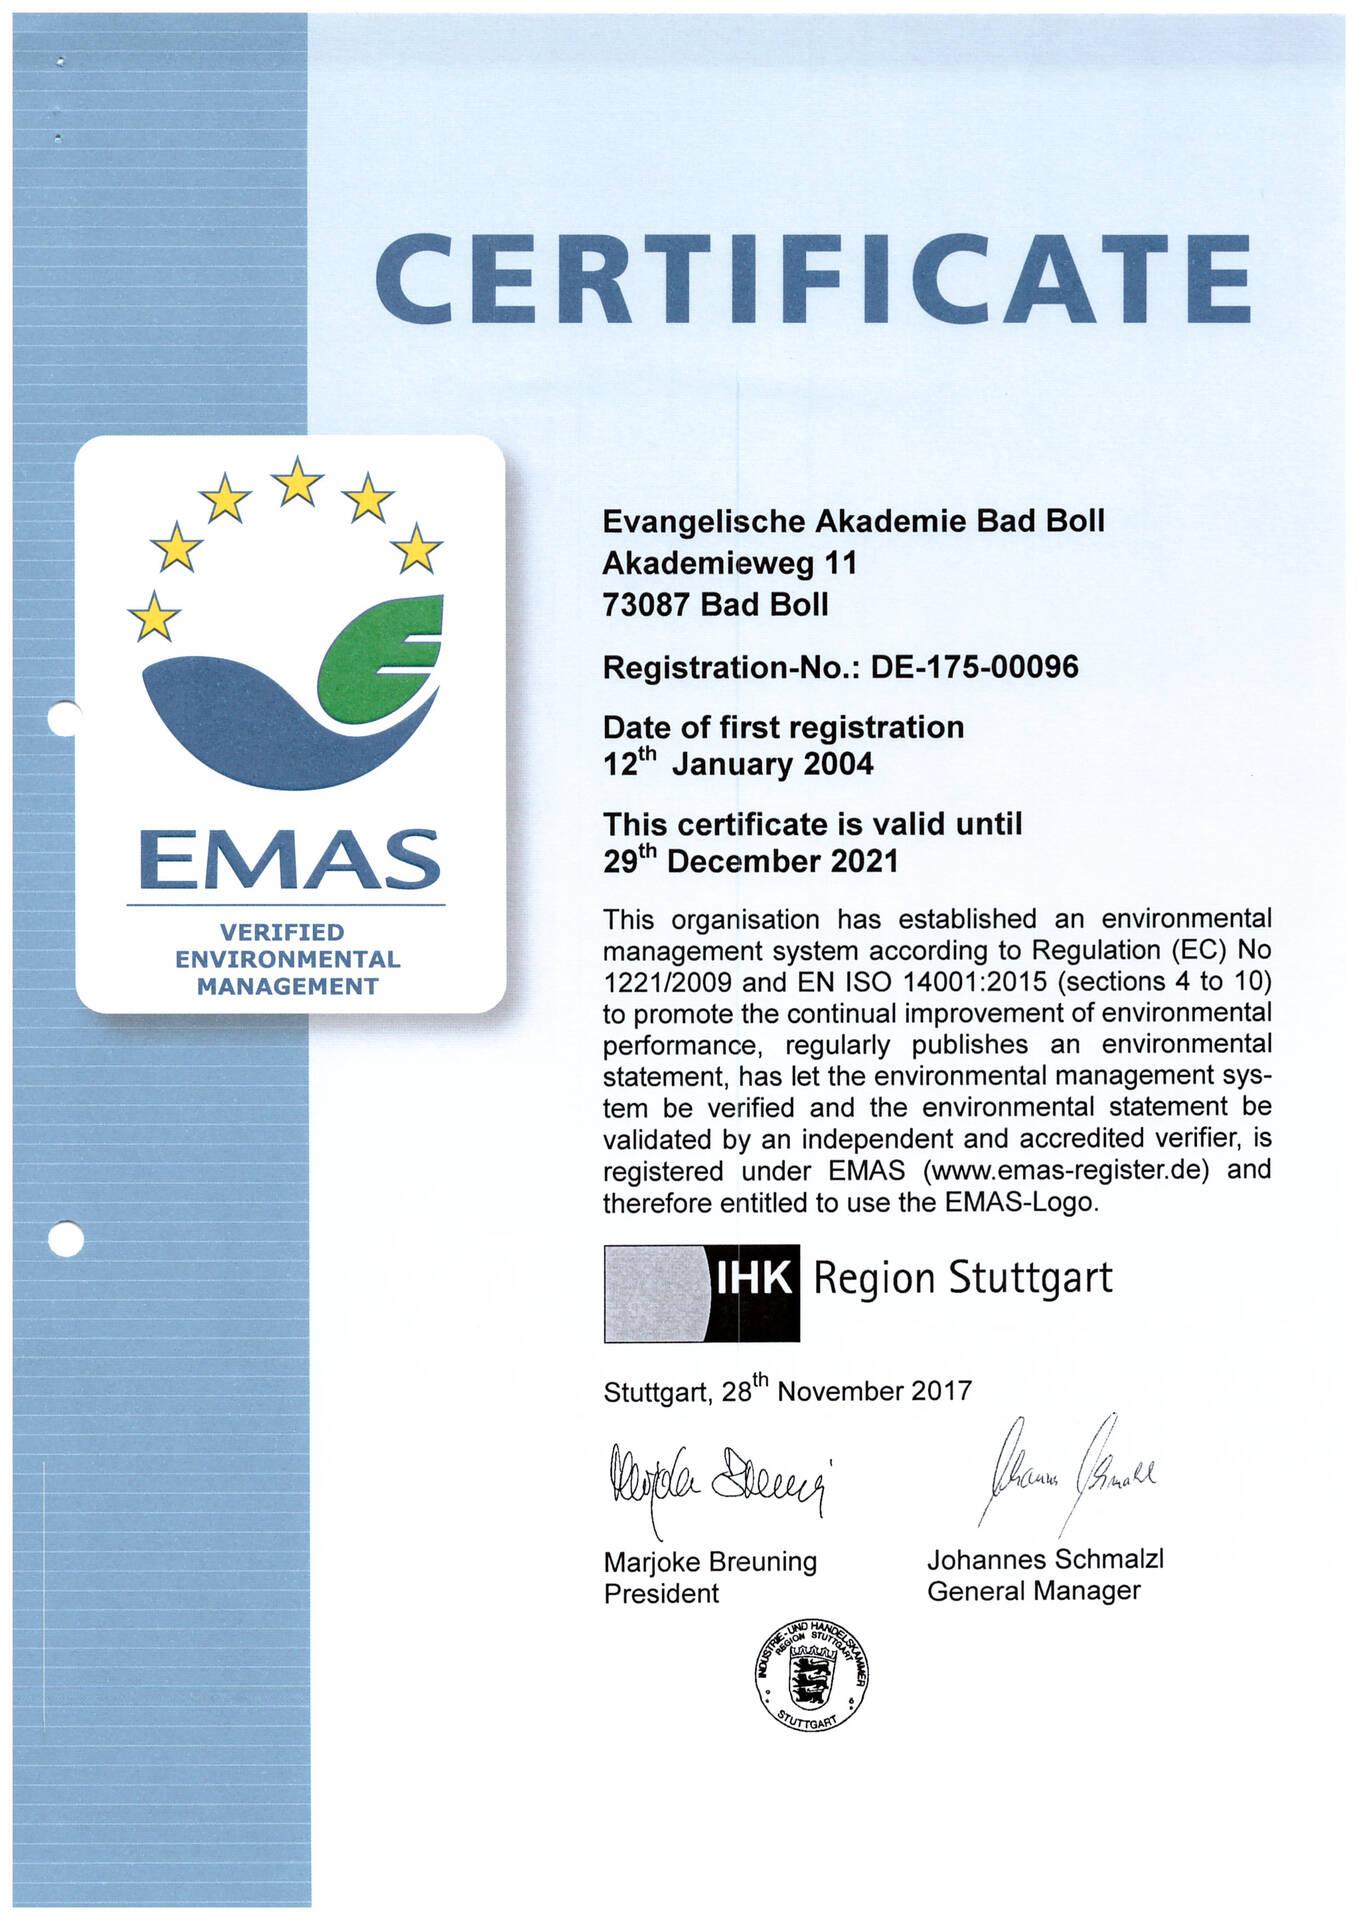 Das EMAS-Zertifikat bis 2021